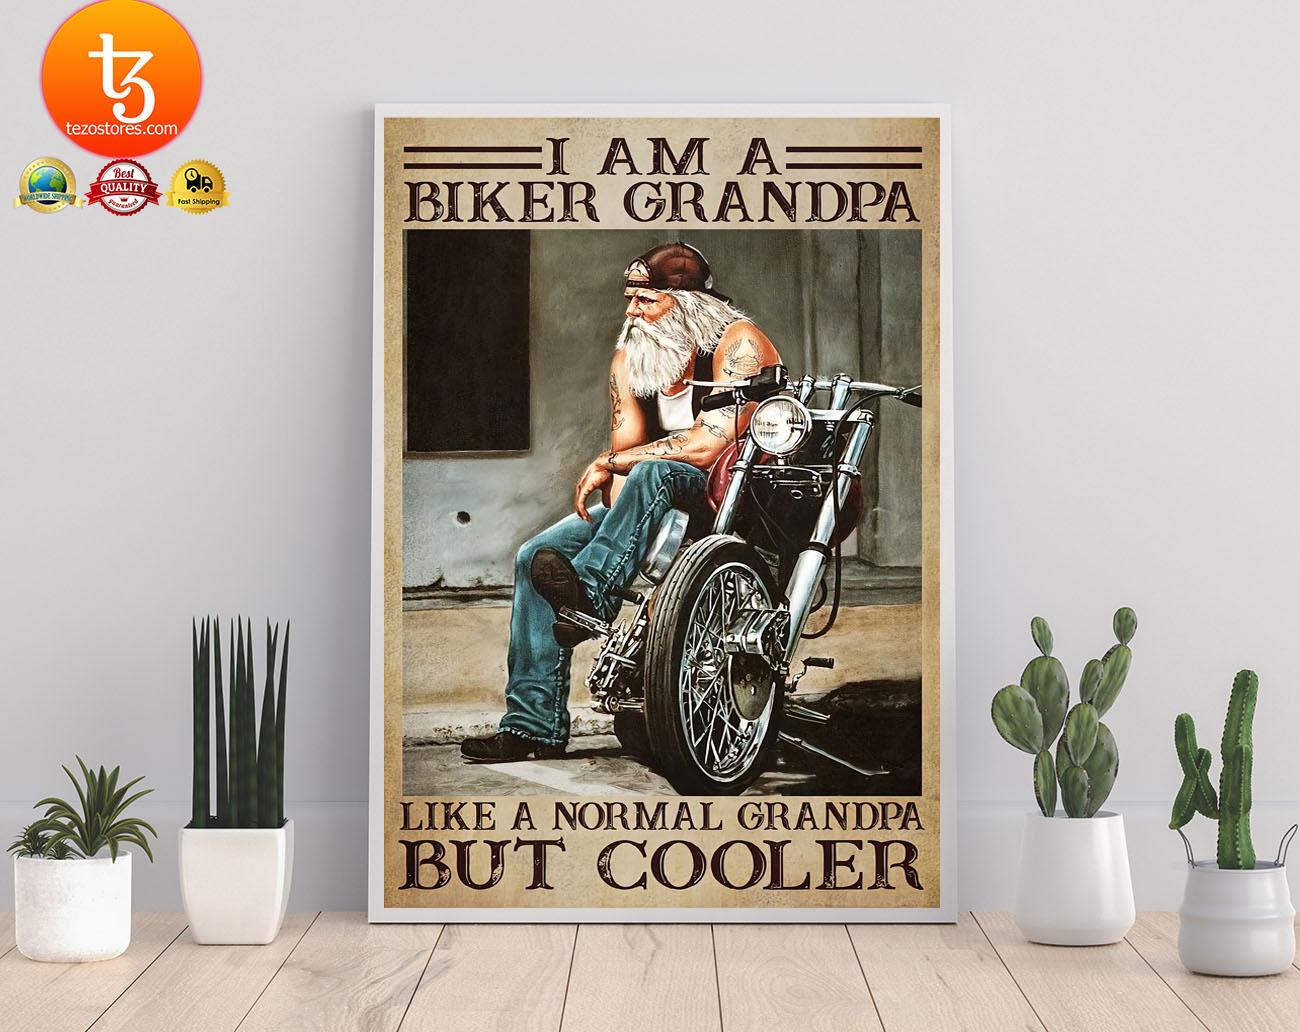 I am a biker grandpa like a normal grandpa but cooler poster 3